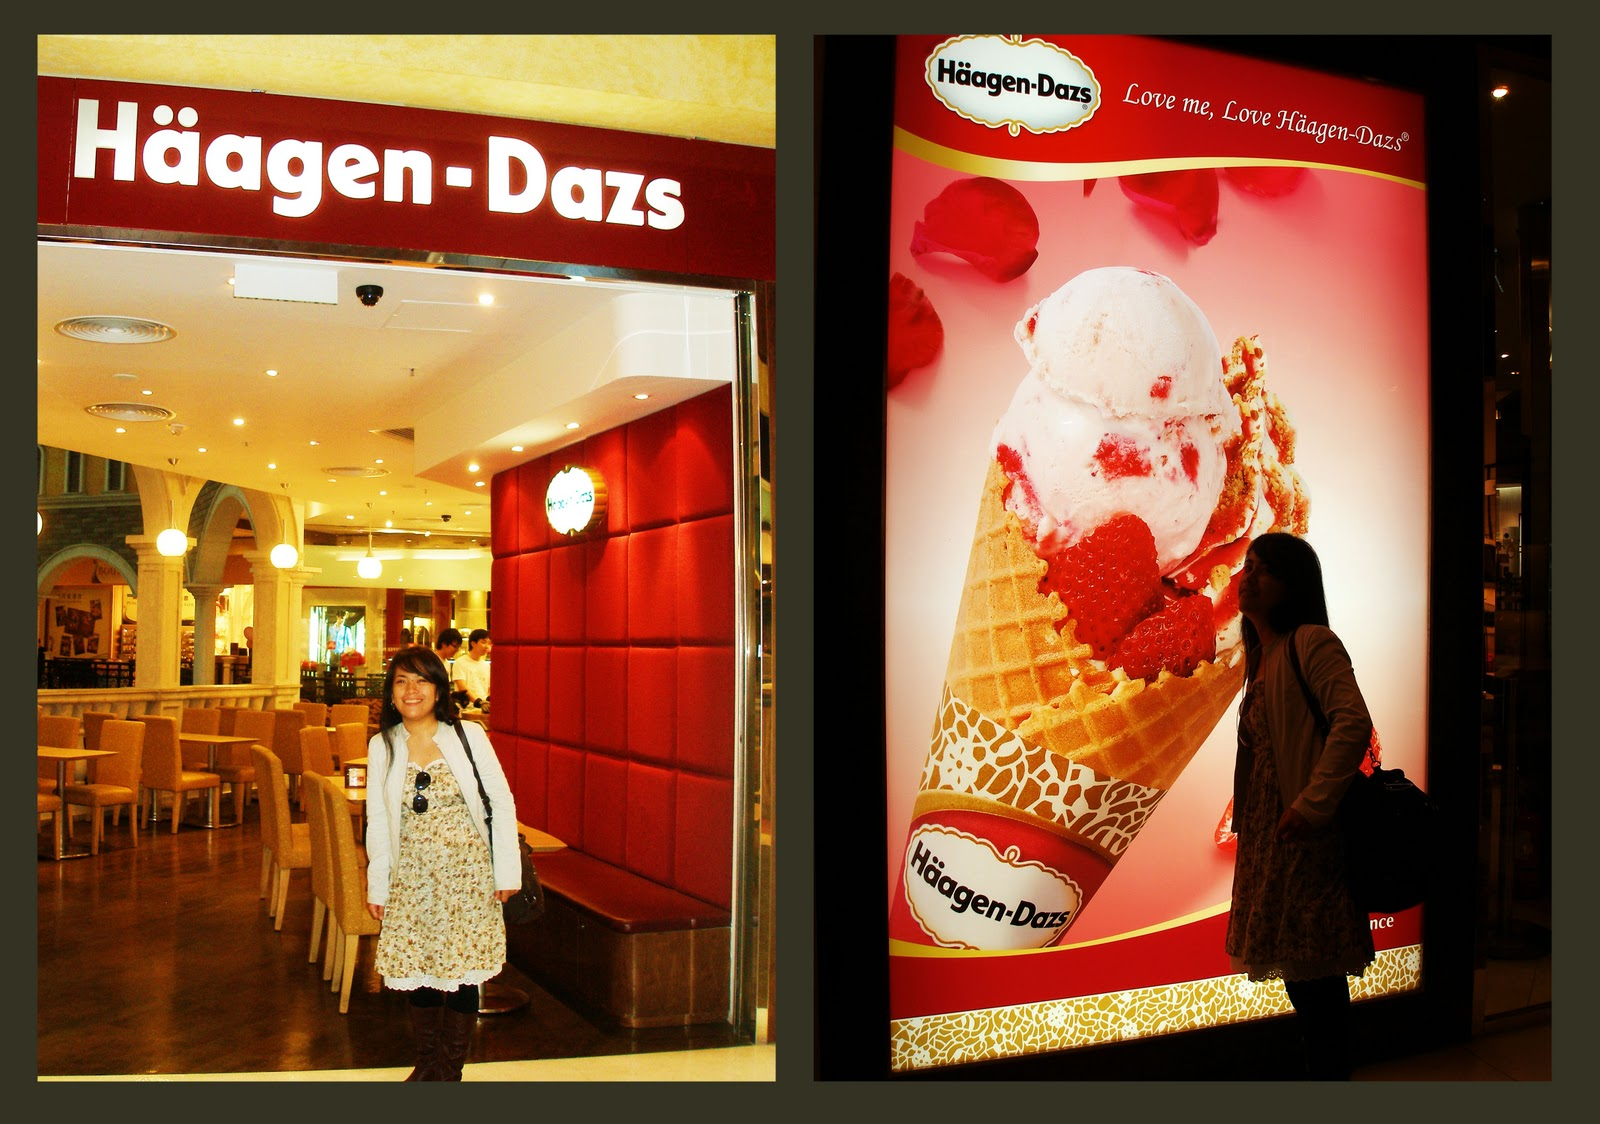 caramel, biscuit, cream, CONTEST ENTRIES, haagen dazs, macau, nuffnang, venetian, hotel,casino, tuklasera, tuklaserang, matipid, gondola, ride, hongkong